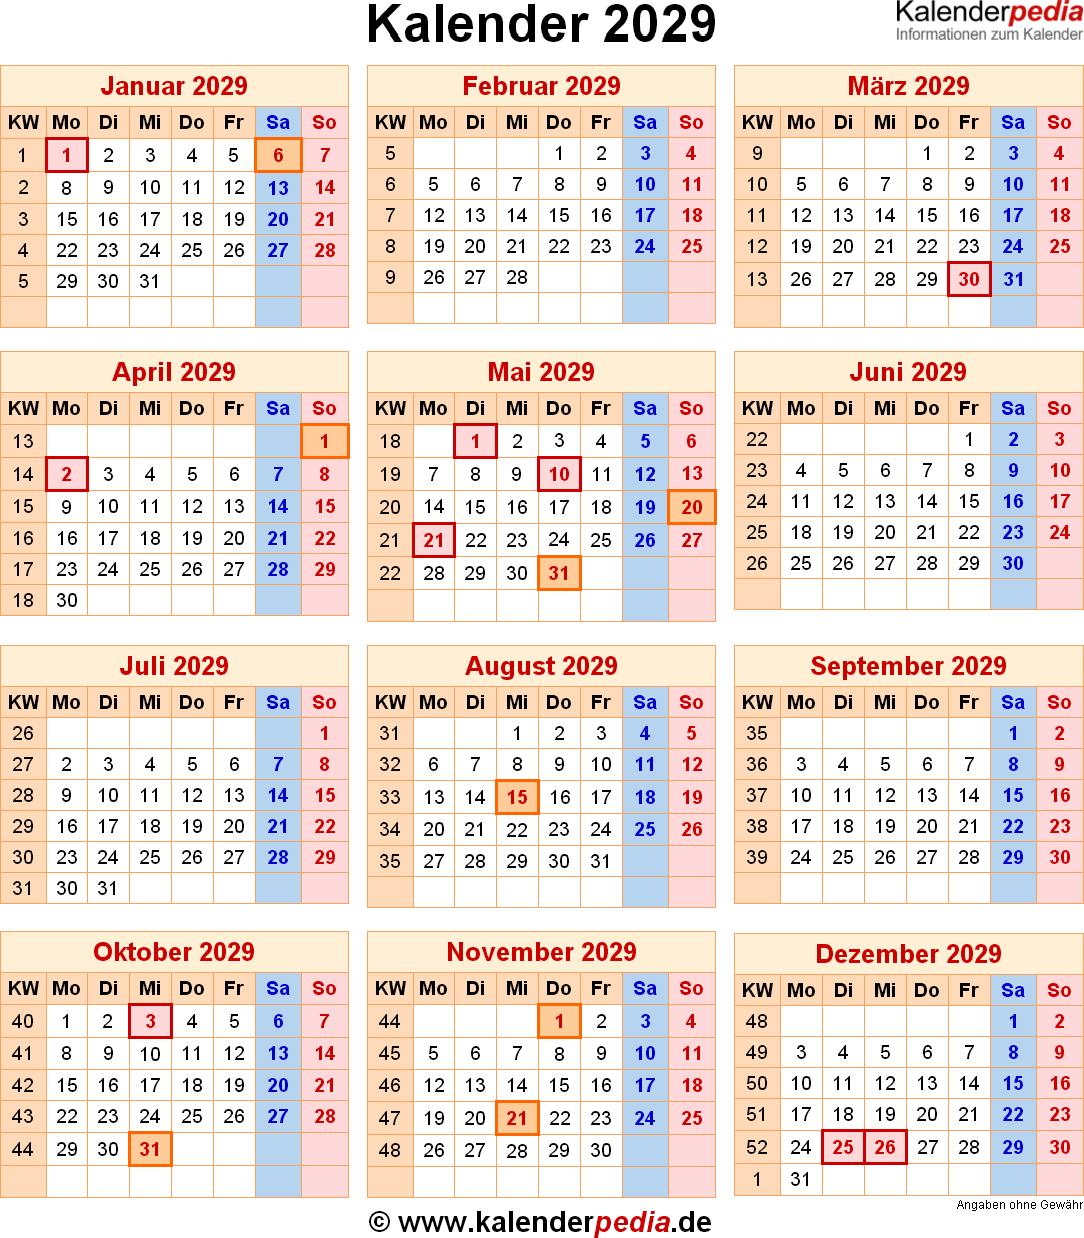 Kalender 2029